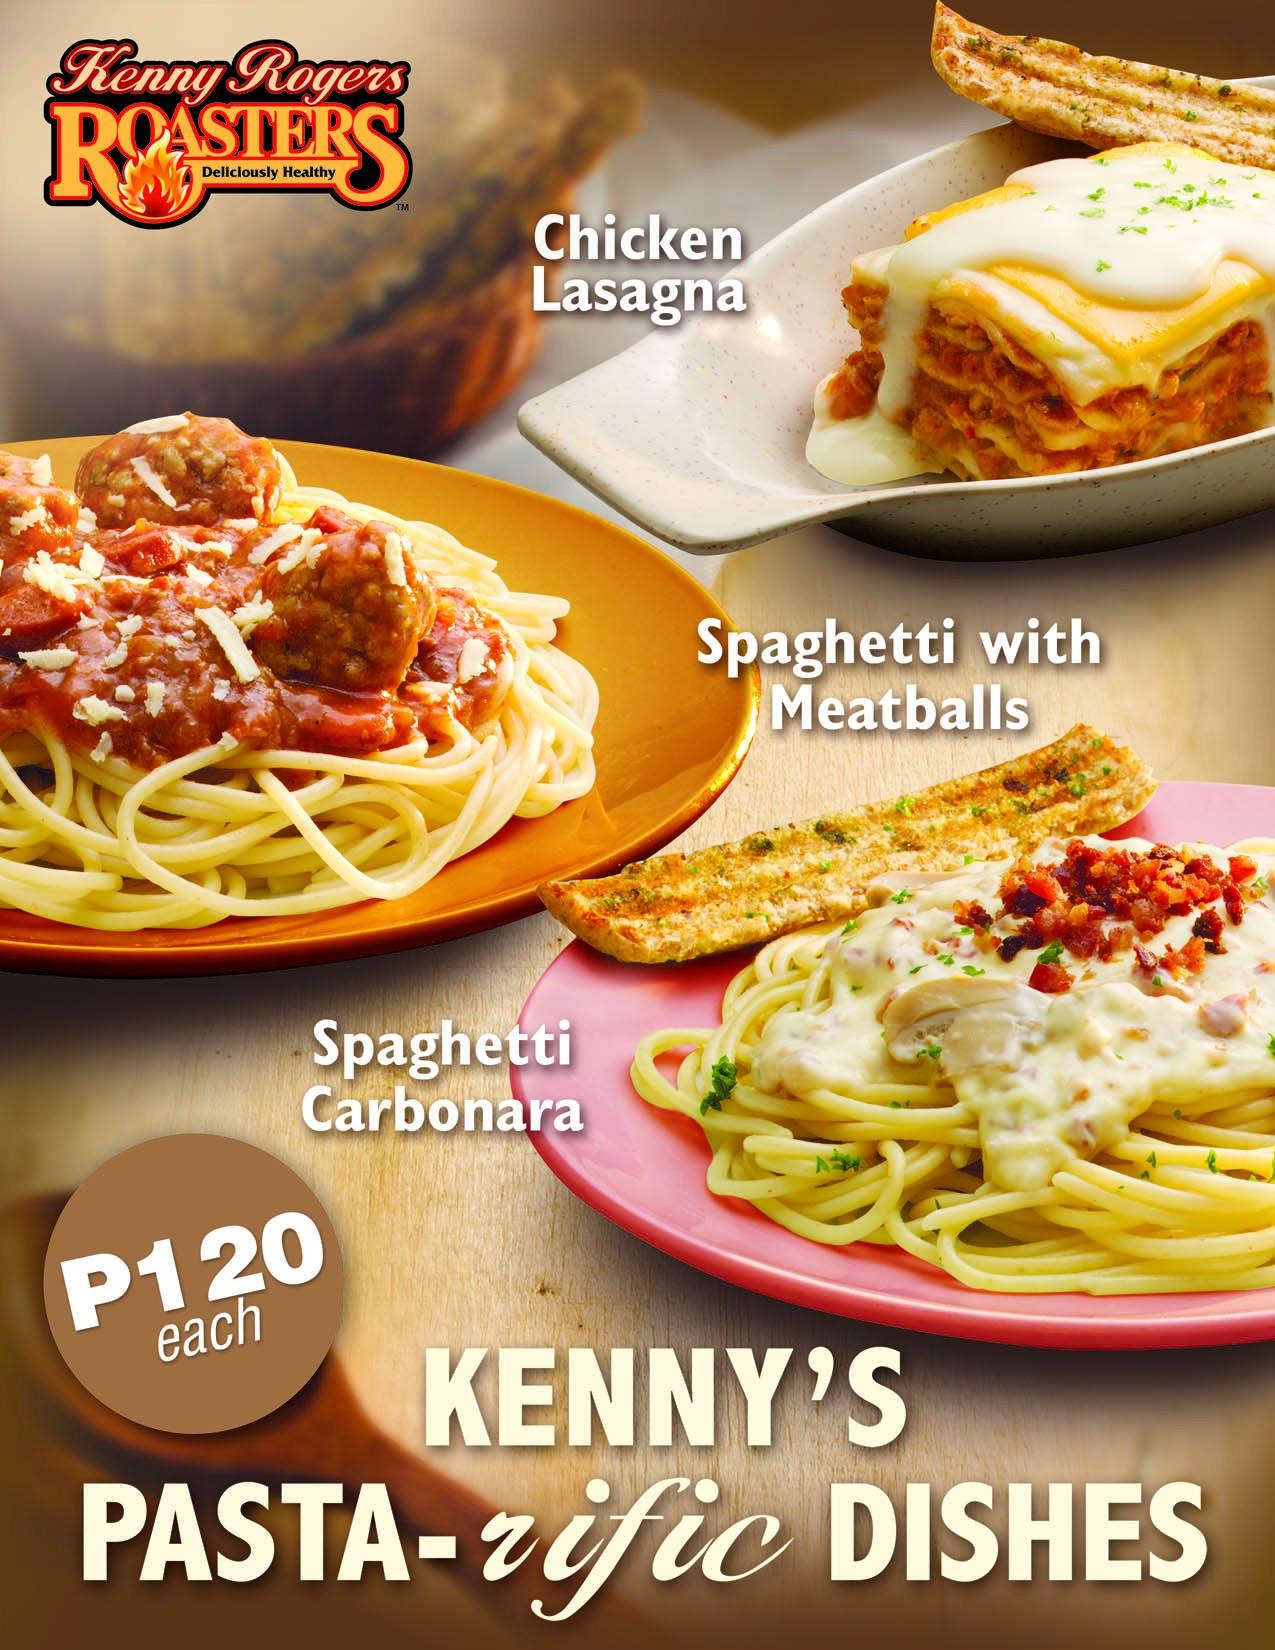 Kenny Rogers Pasta - Food Styling Manila